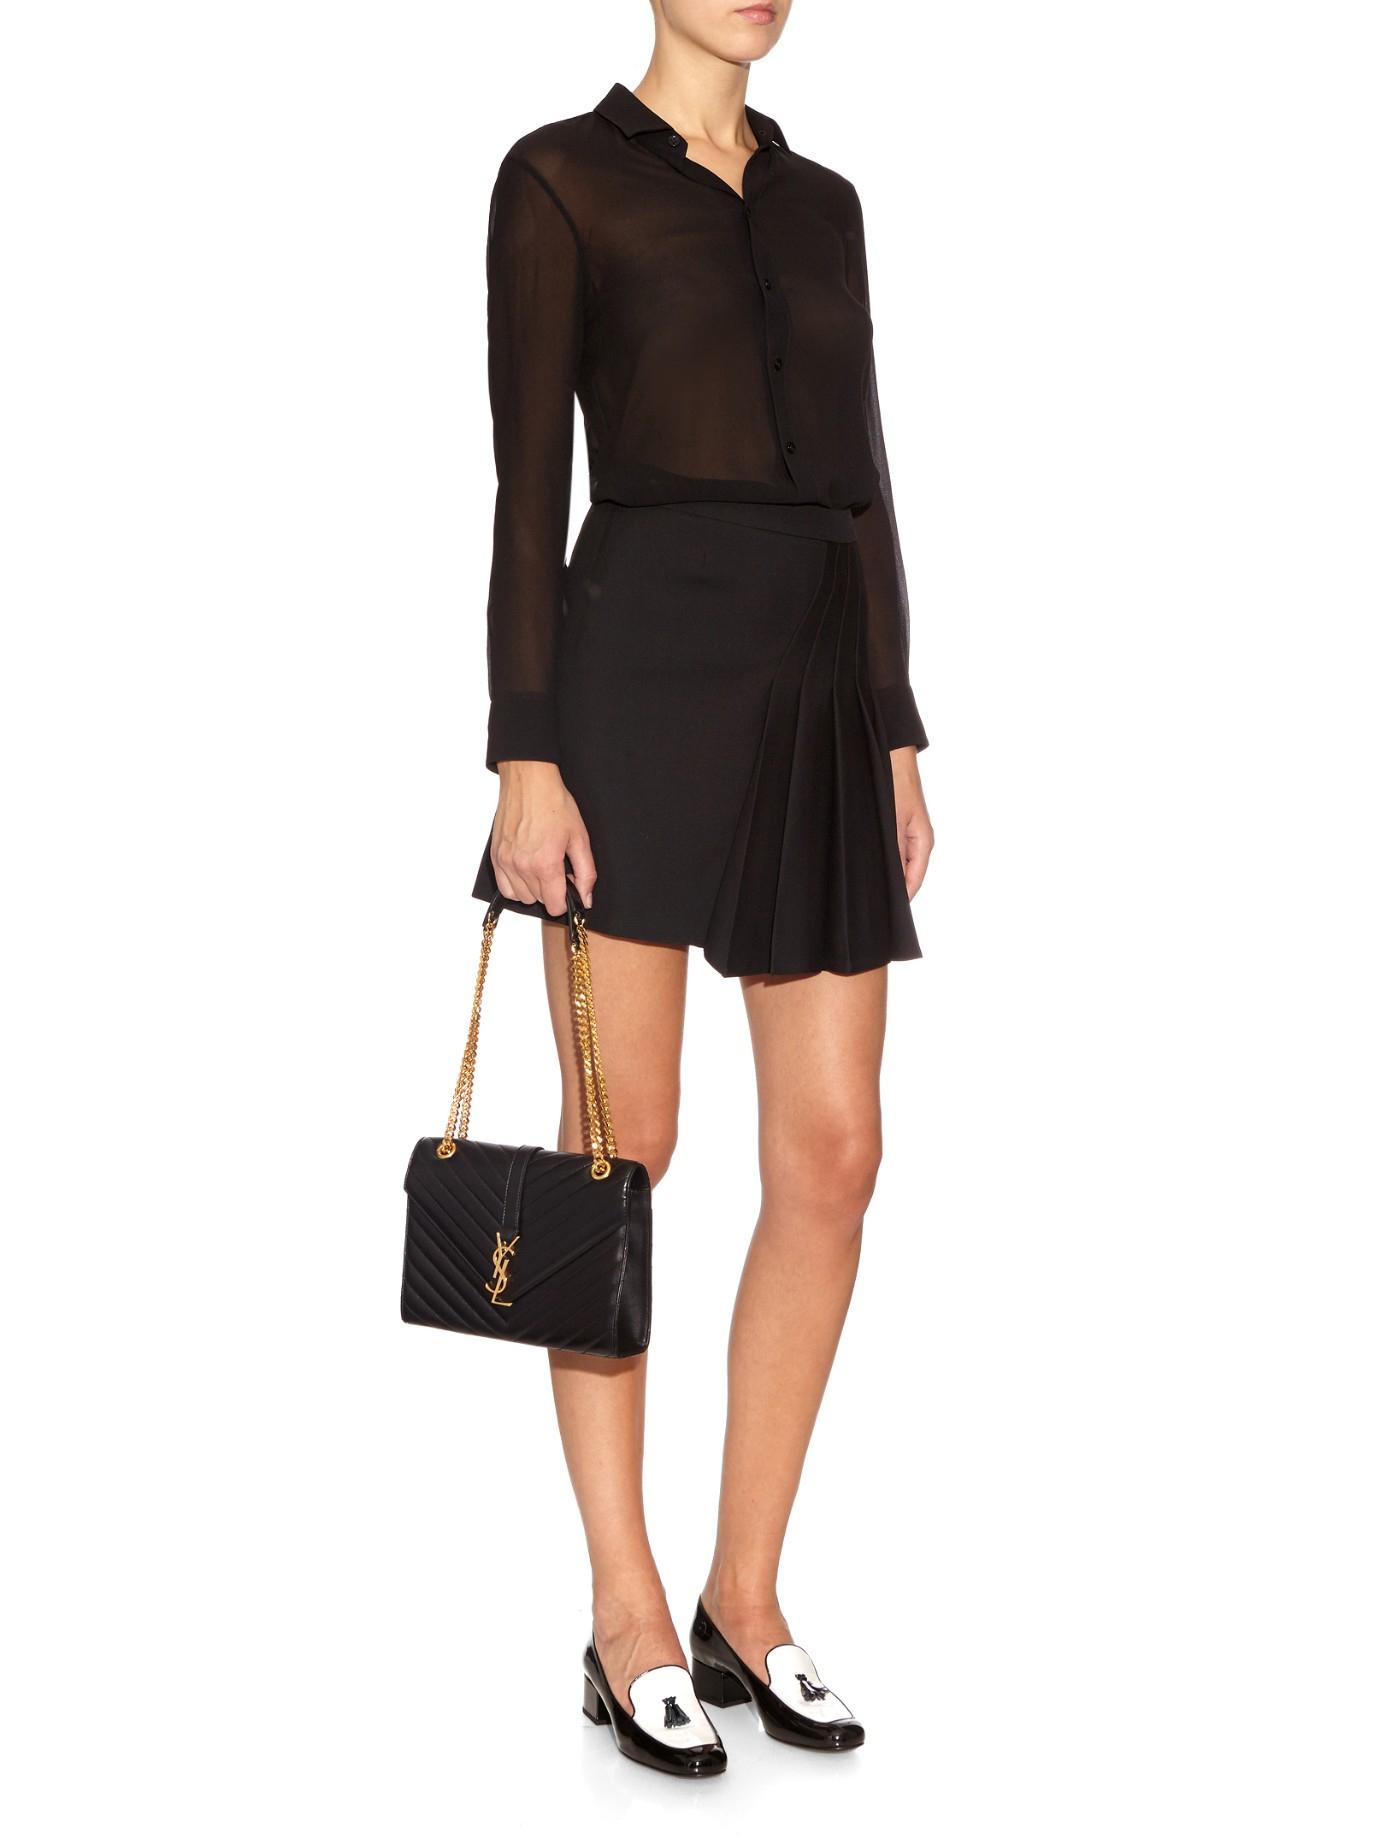 Lyst - Saint Laurent Classic Monogram Quilted-Leather Shoulder Bag in Black e81c1425a8047